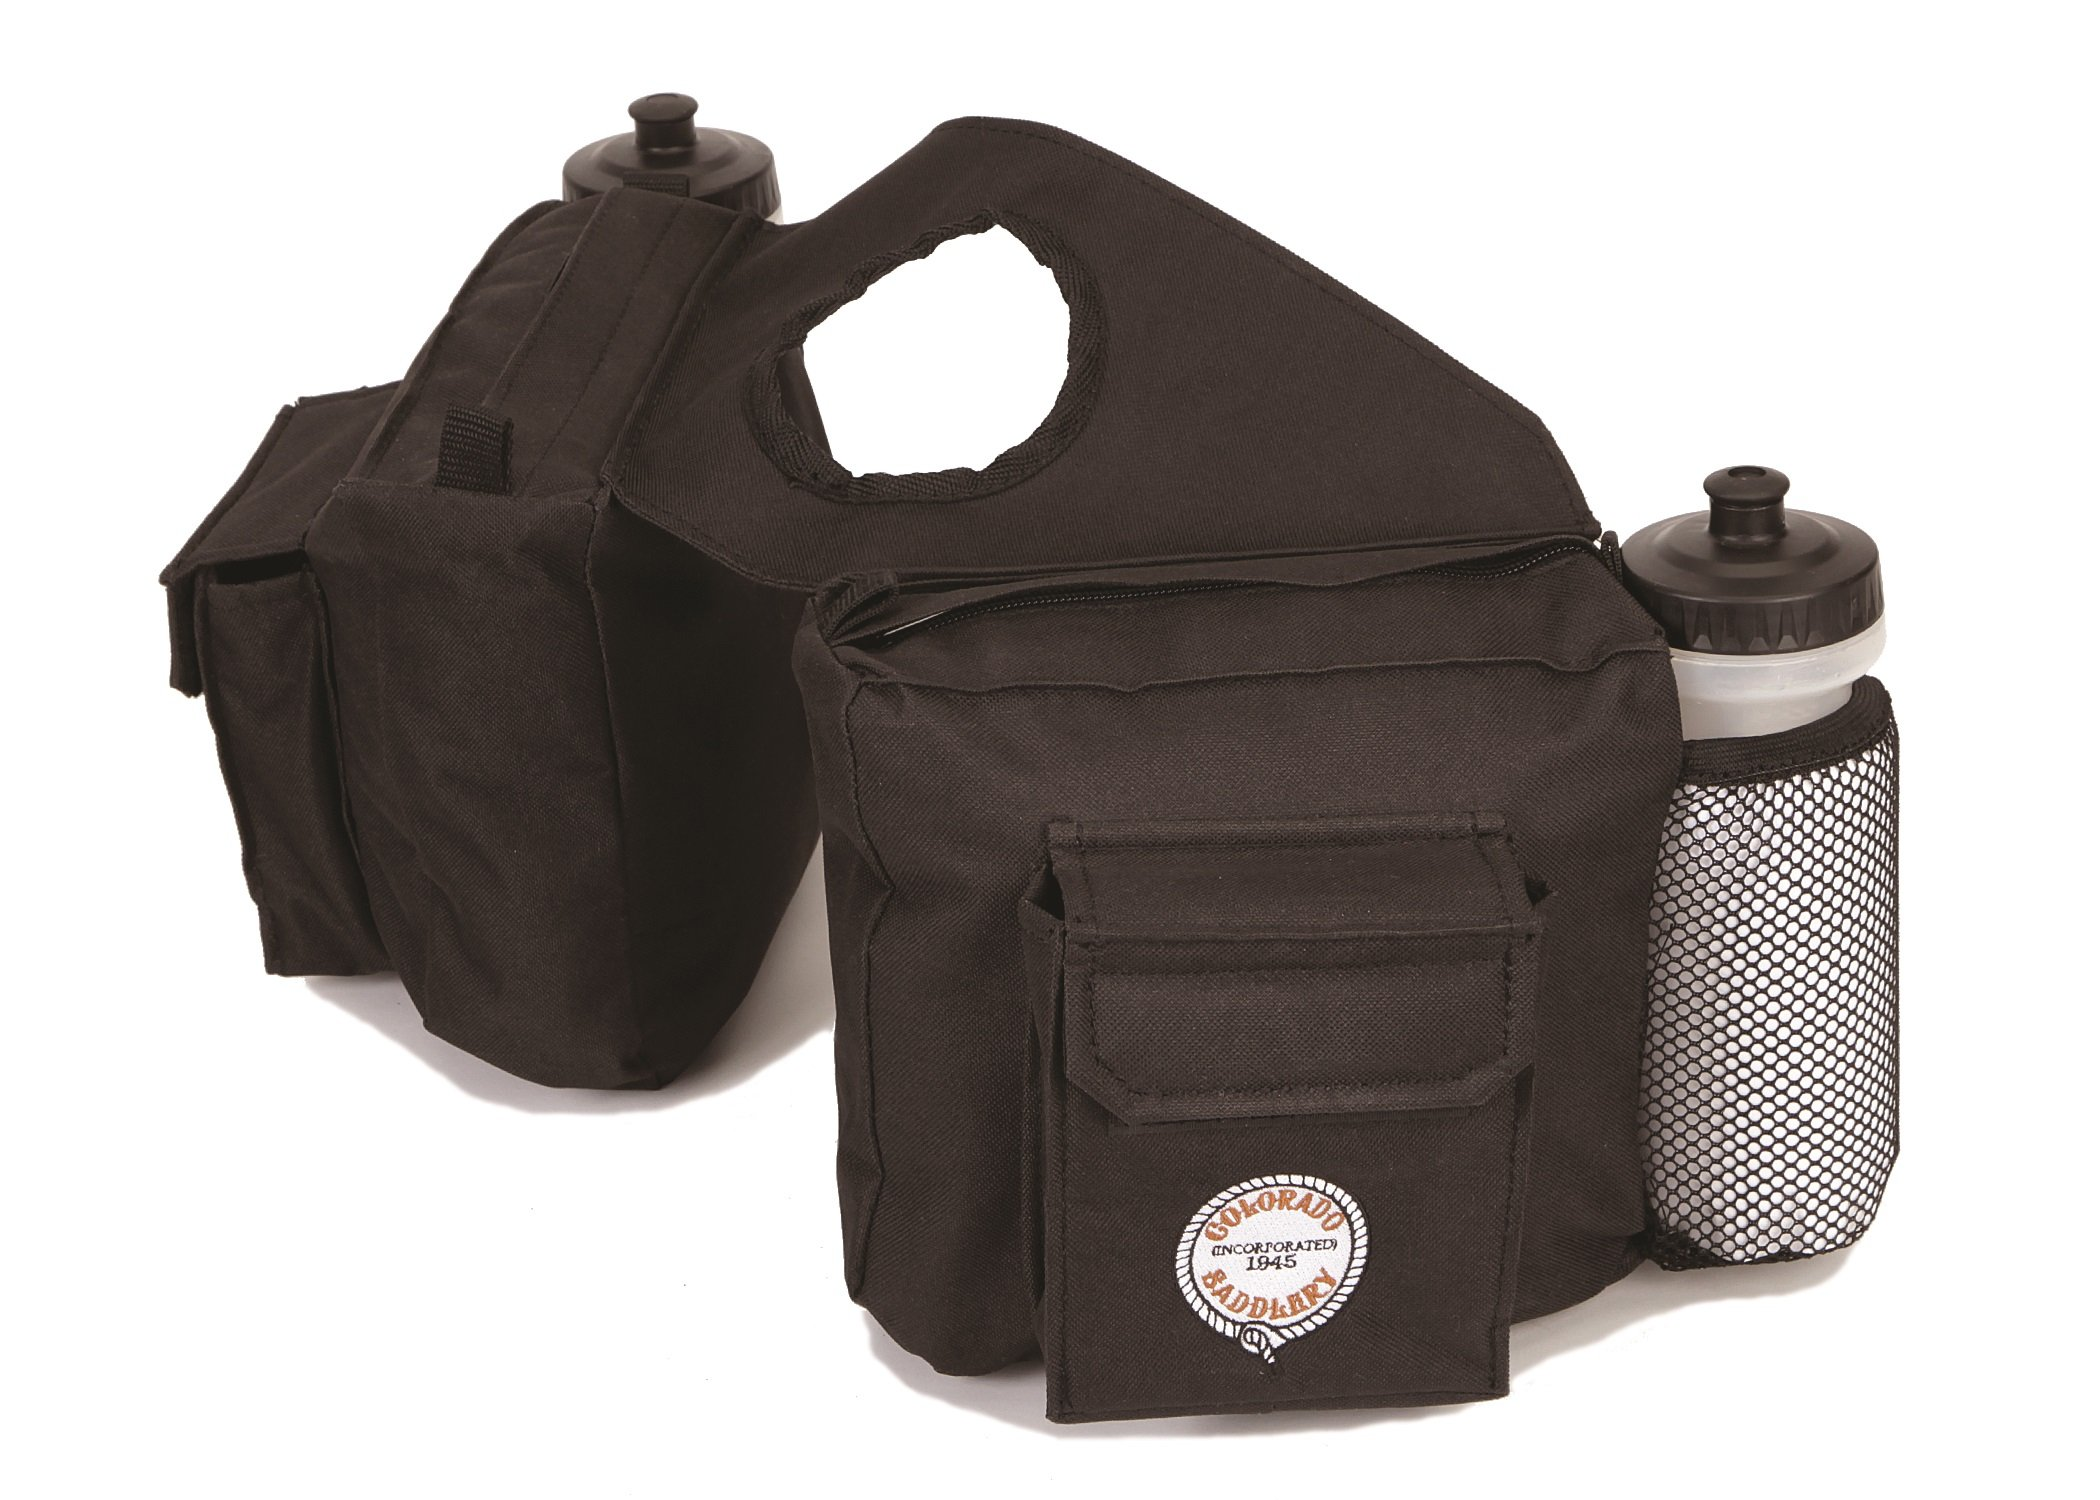 Colorado Saddlery The 1-164 Ultra Rider 6 Pocket Horn Bag